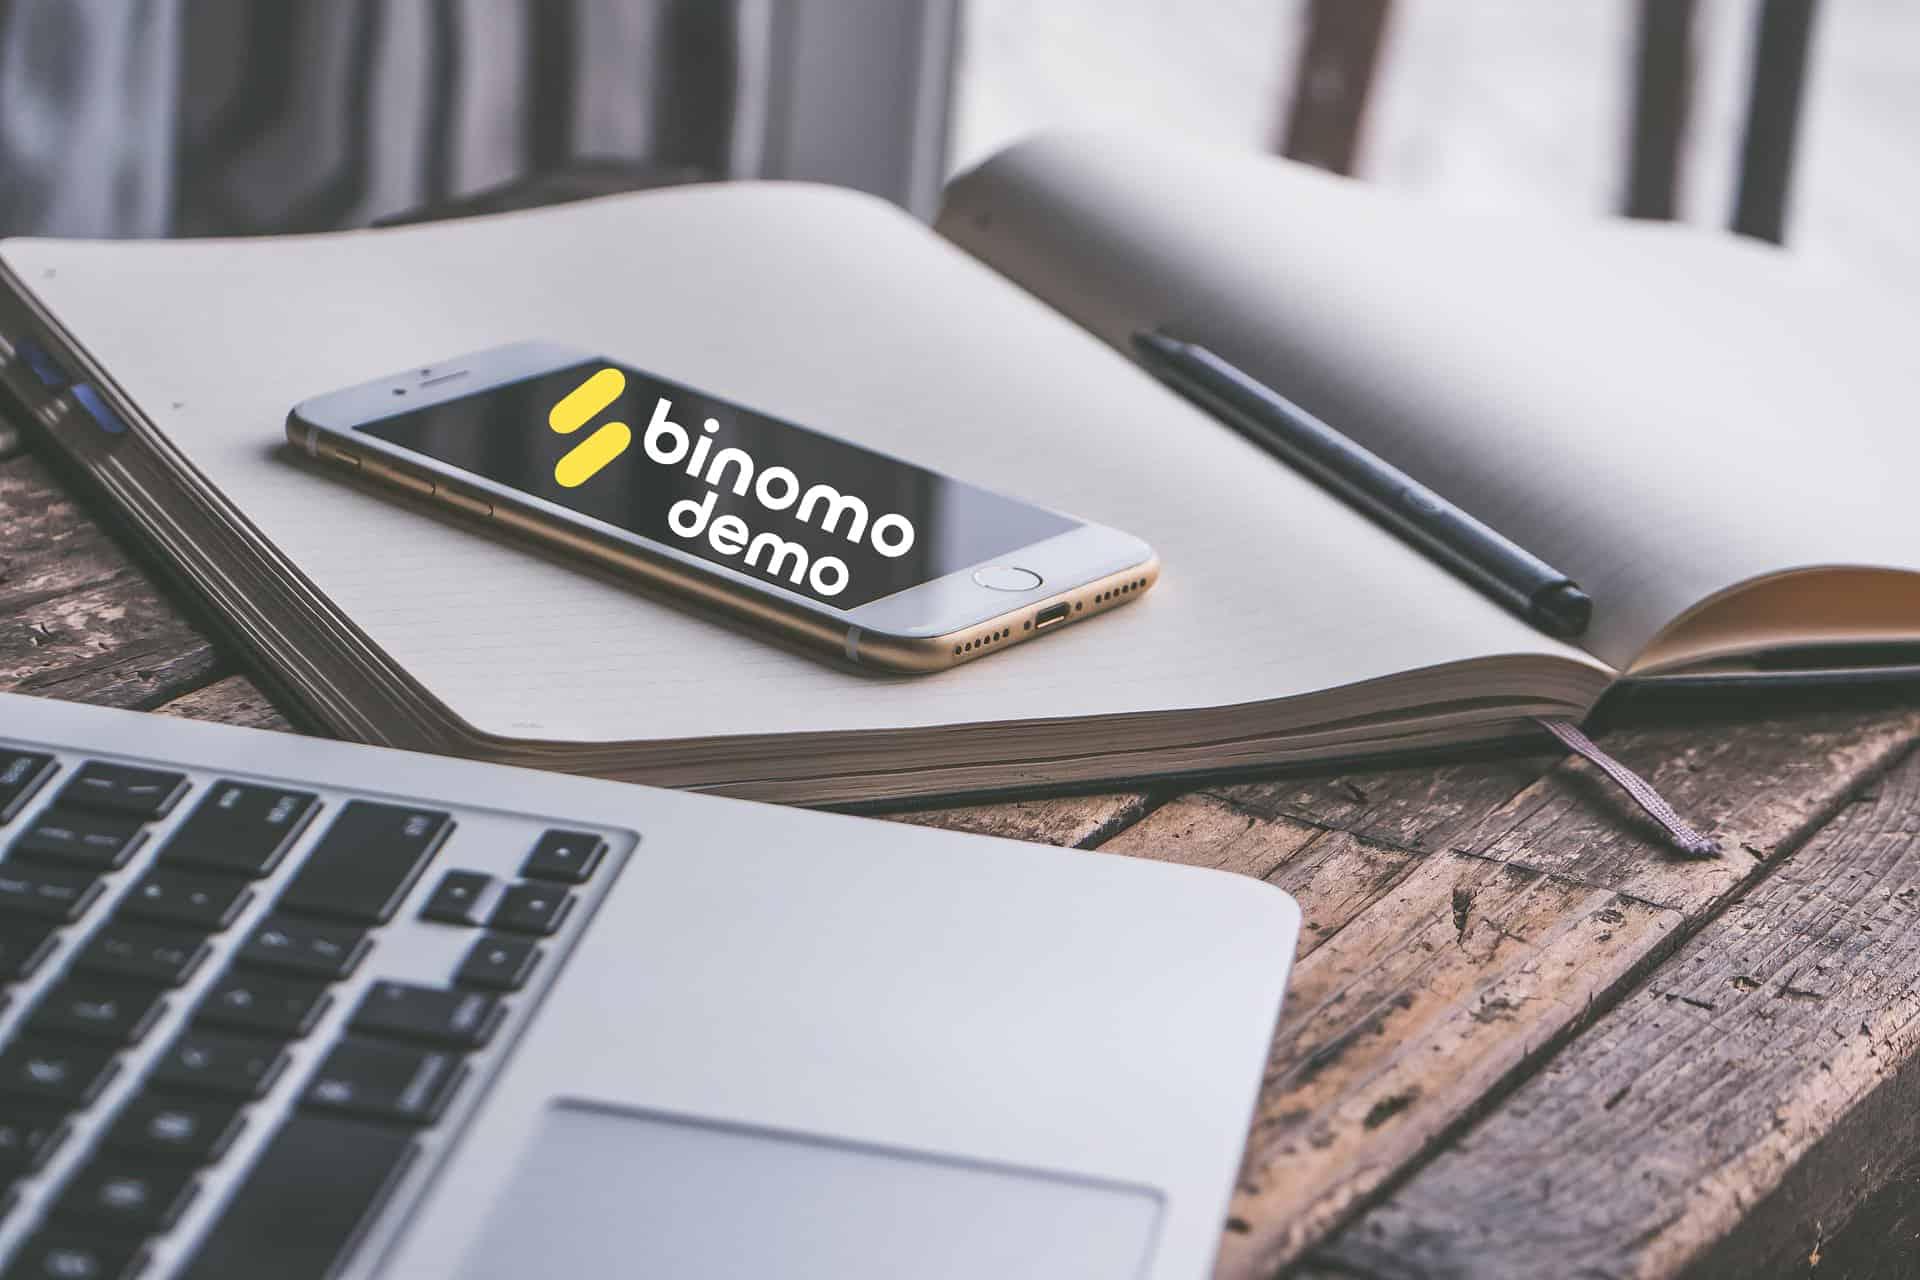 trading with binomo mobile app 2